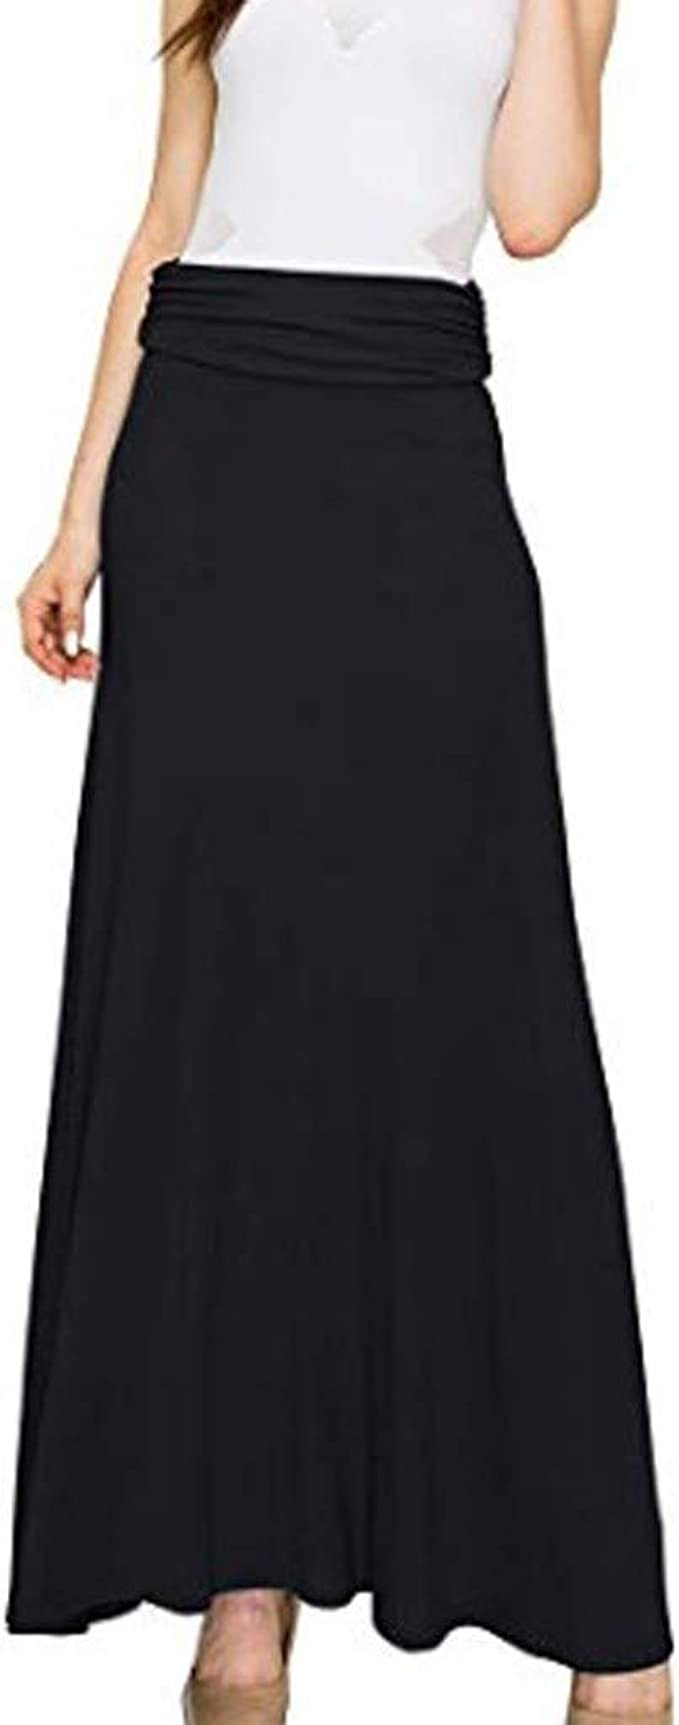 Abetteric Womens Elegant Silm 2 Pieces Outfit Bandeau Long Sleeve Playsuit